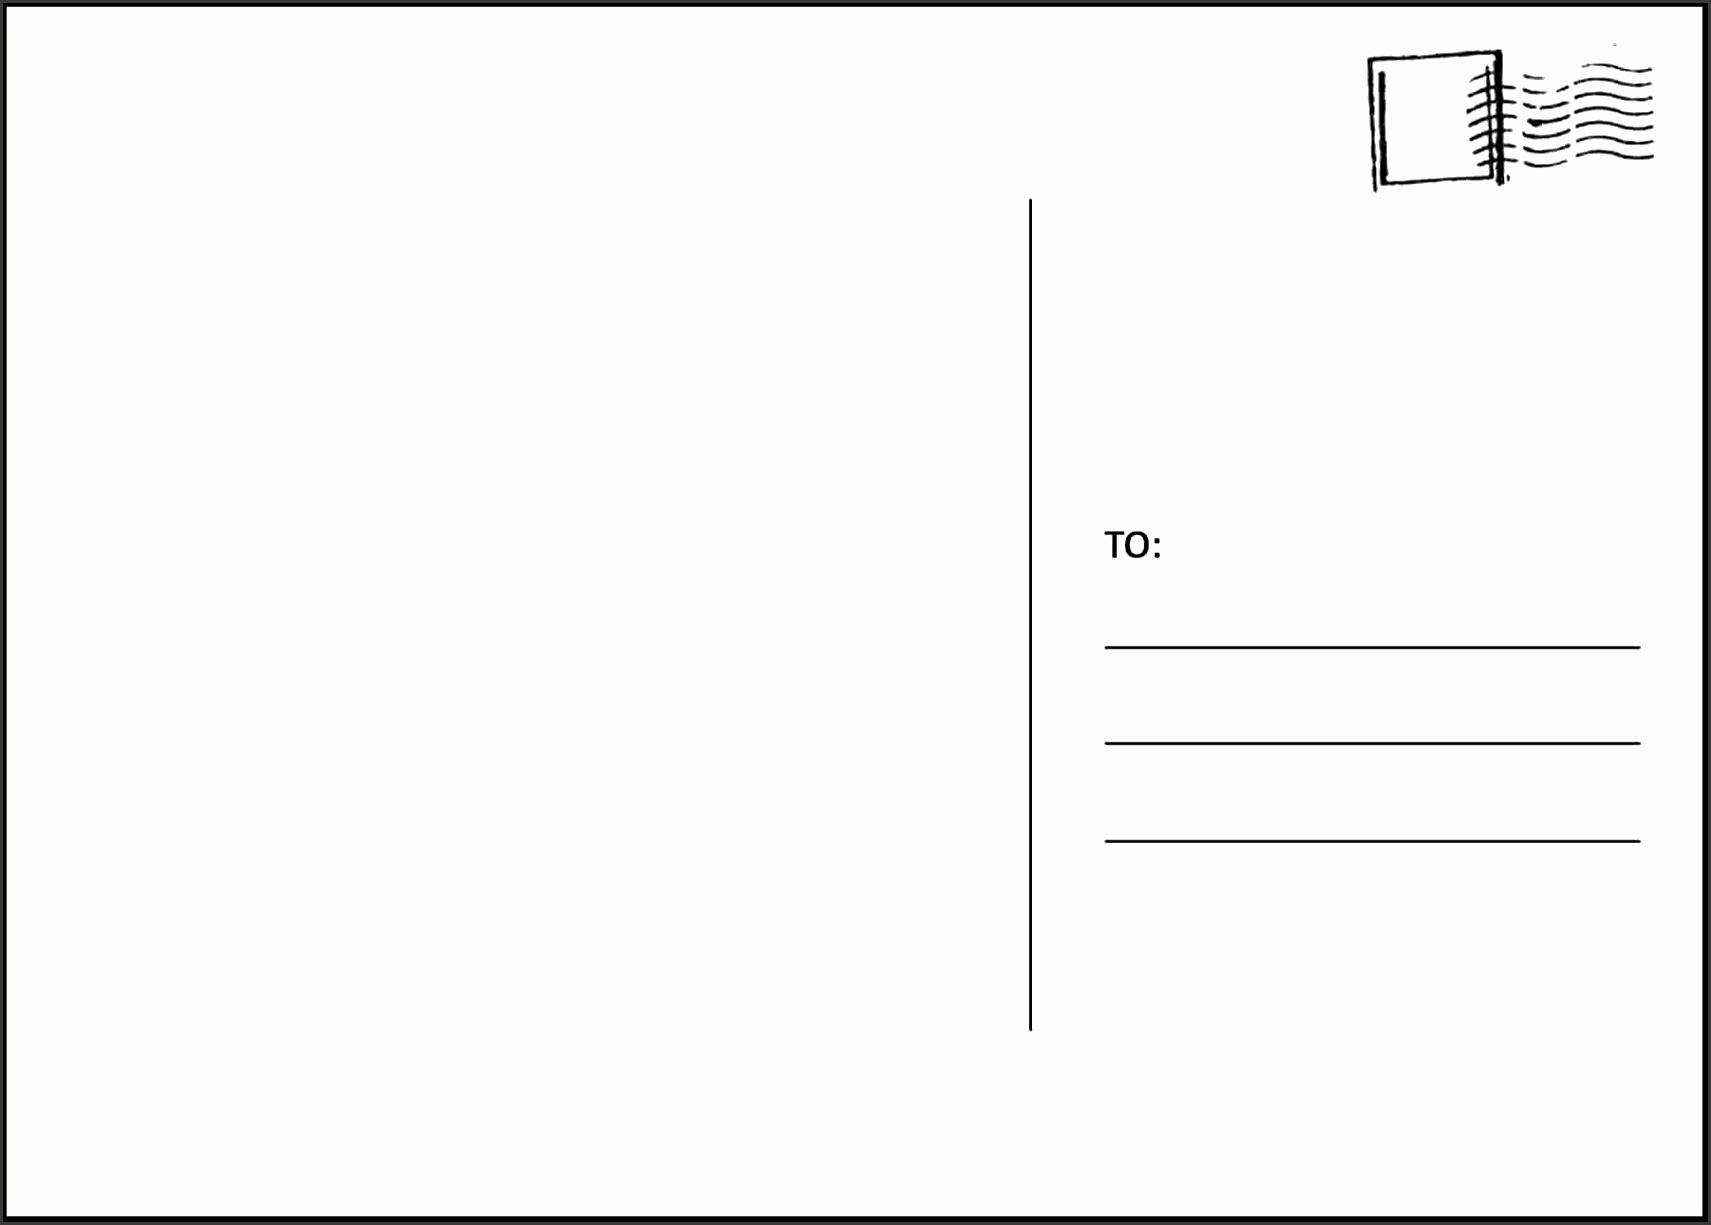 postcard1 postcard template for word